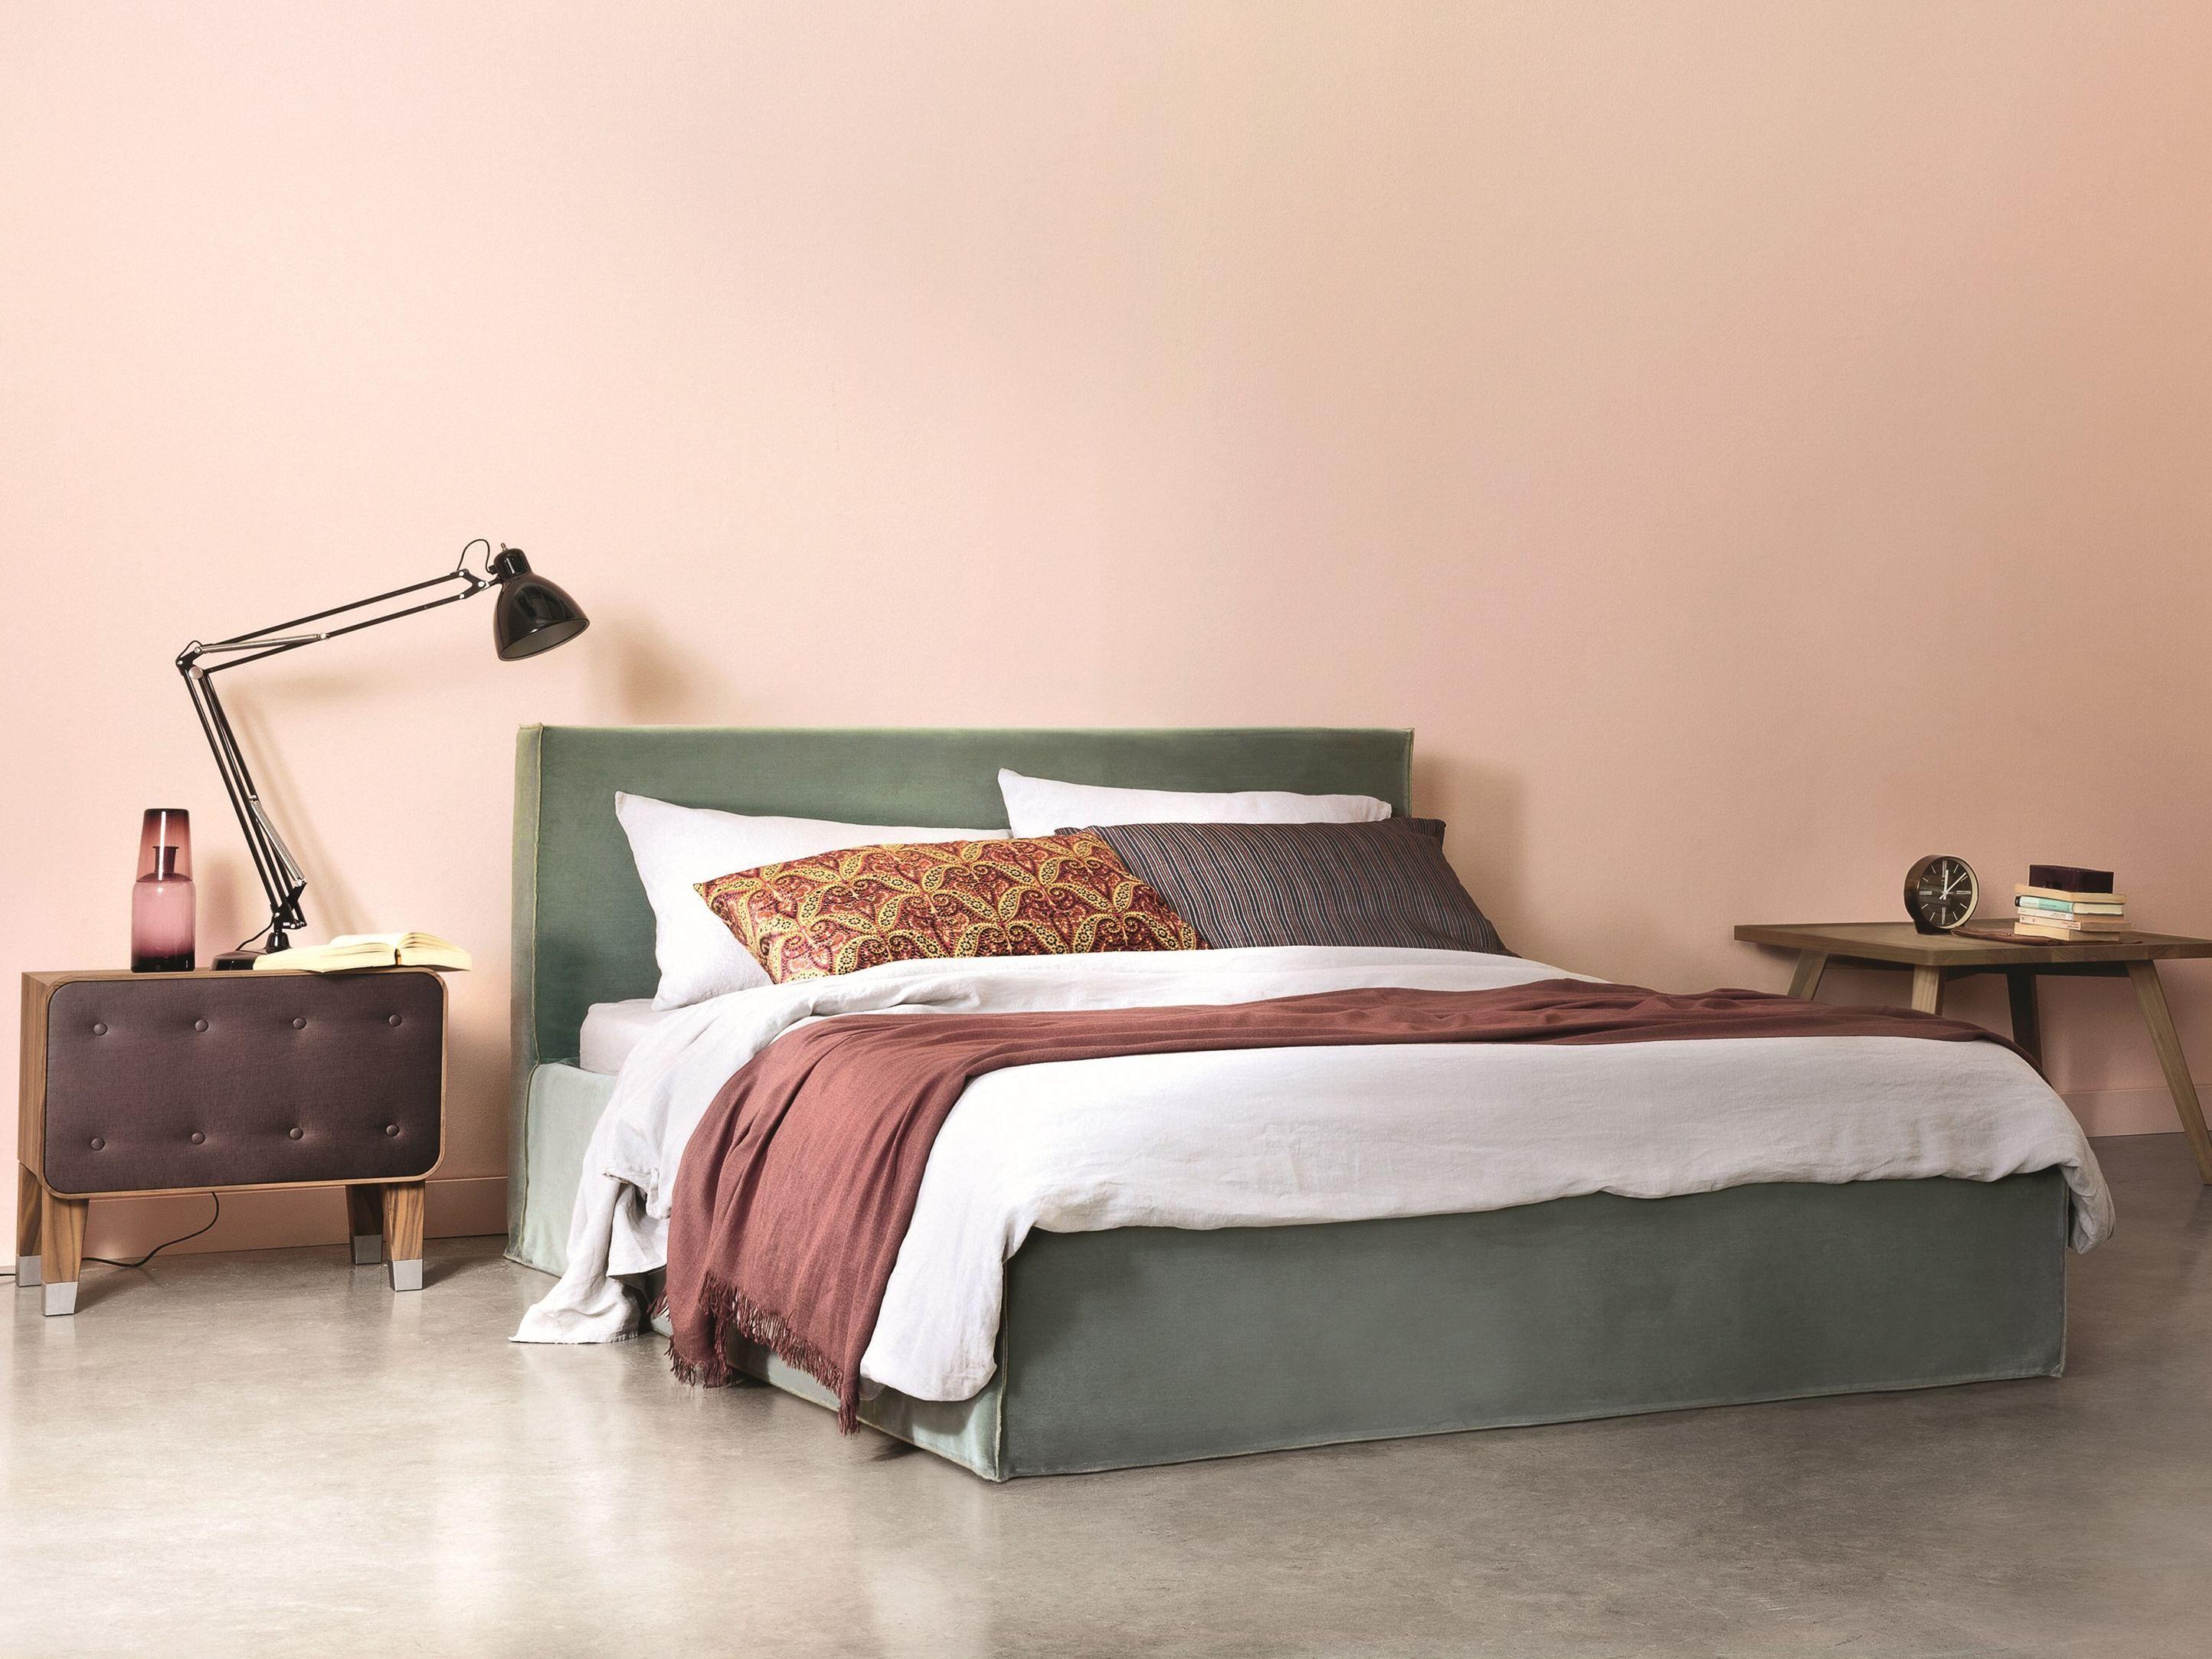 Brick 80 letto matrimoniale by gervasoni design paola navone - Mobili gervasoni ...